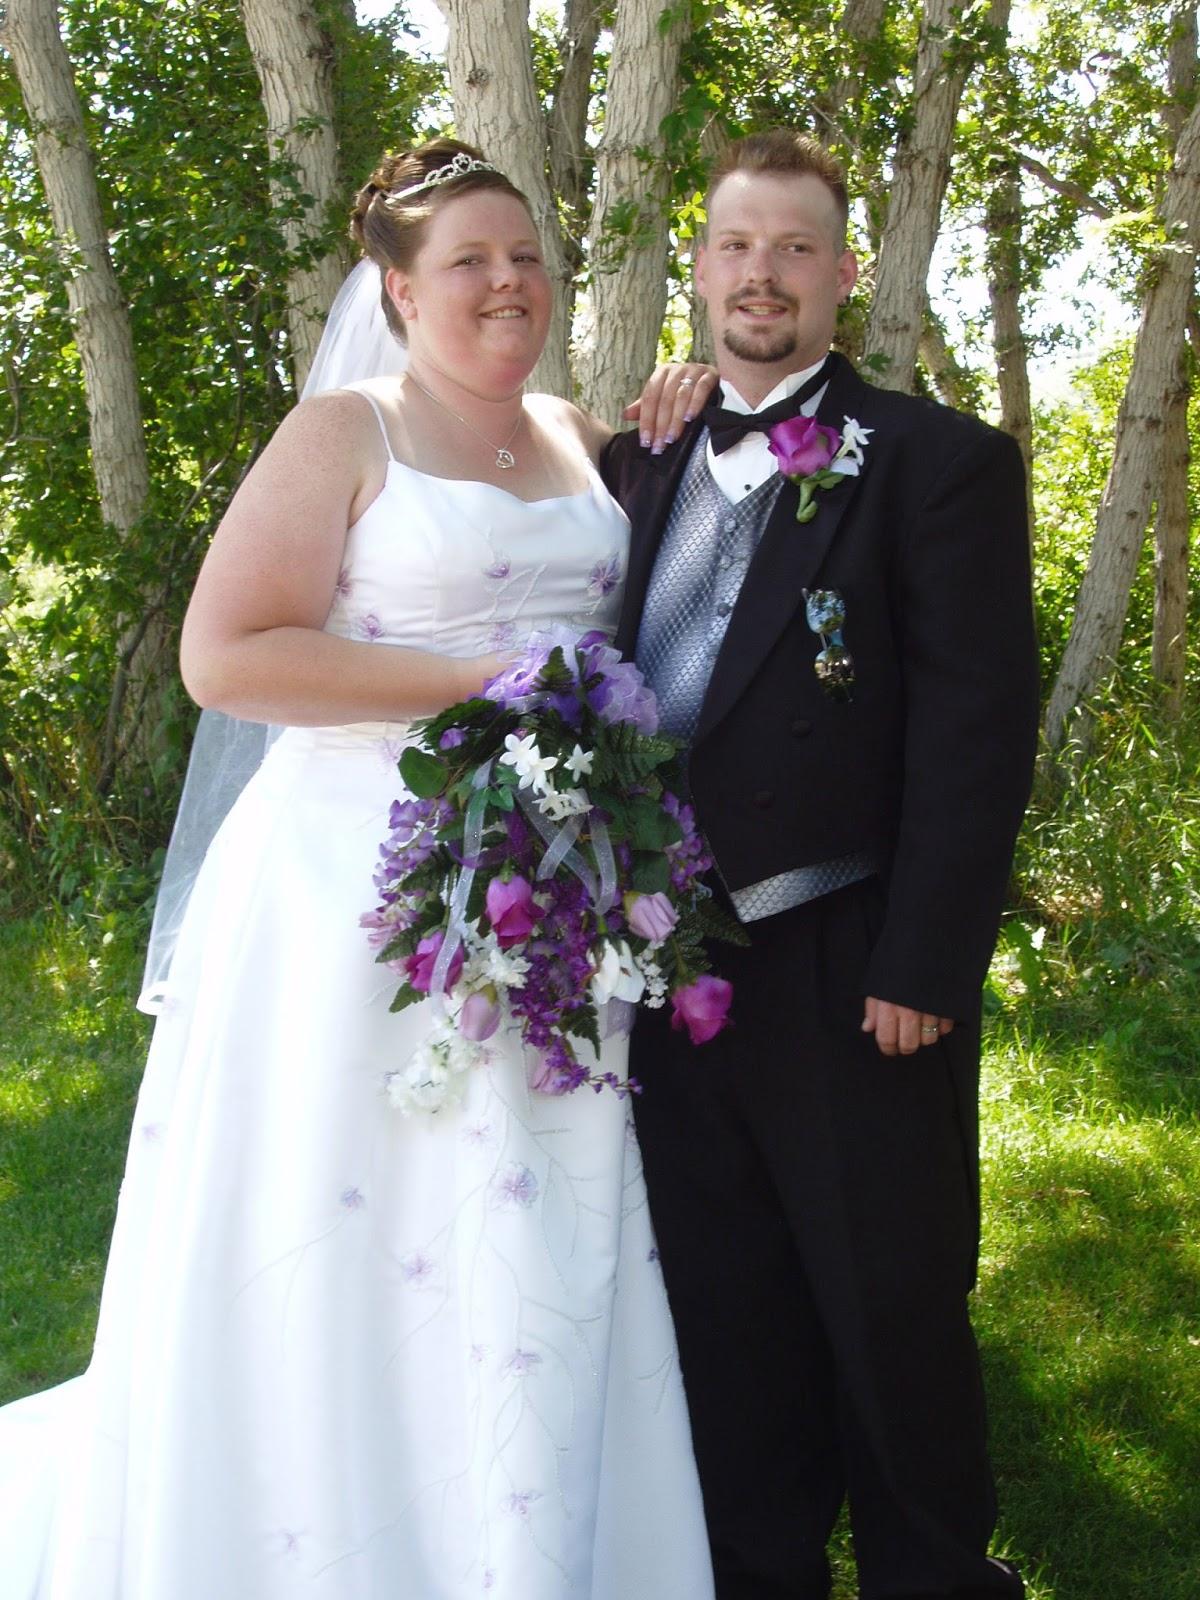 Infant Wedding Dresses 51 Great My husband and I